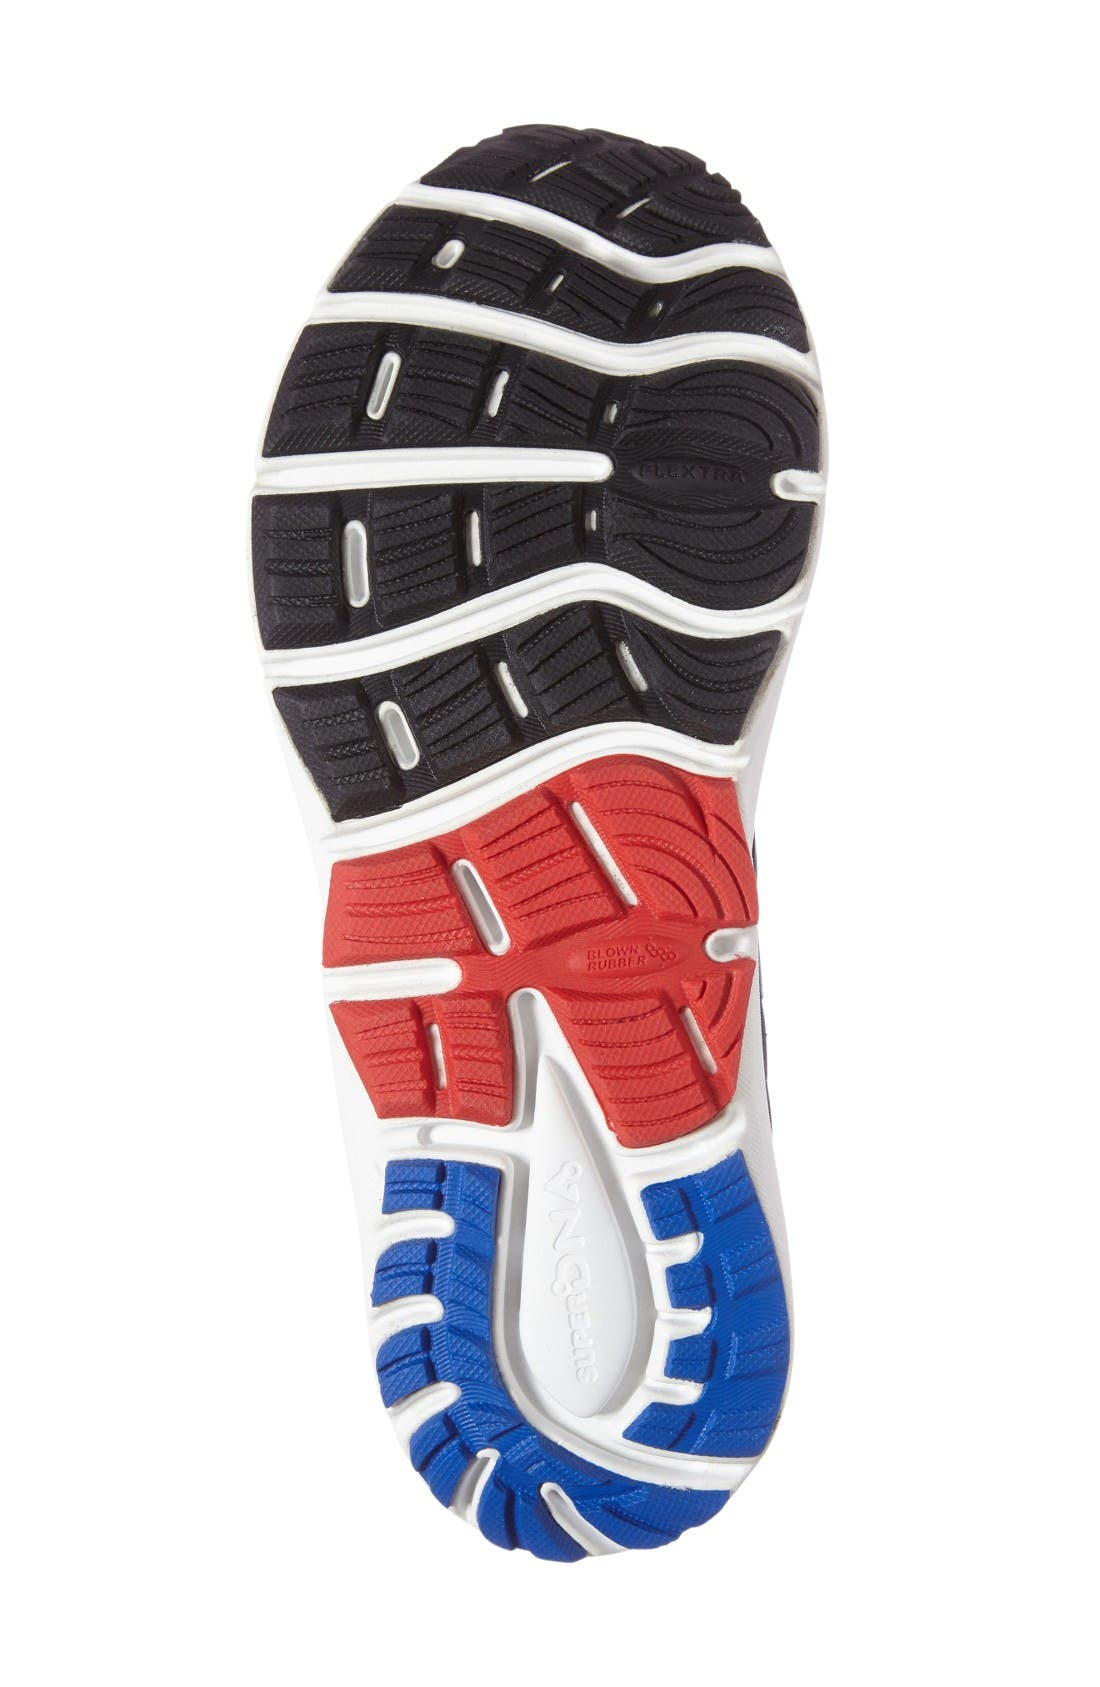 Transcend 4 Running Shoe,                             Alternate thumbnail 4, color,                             Blue/ Black/ Red